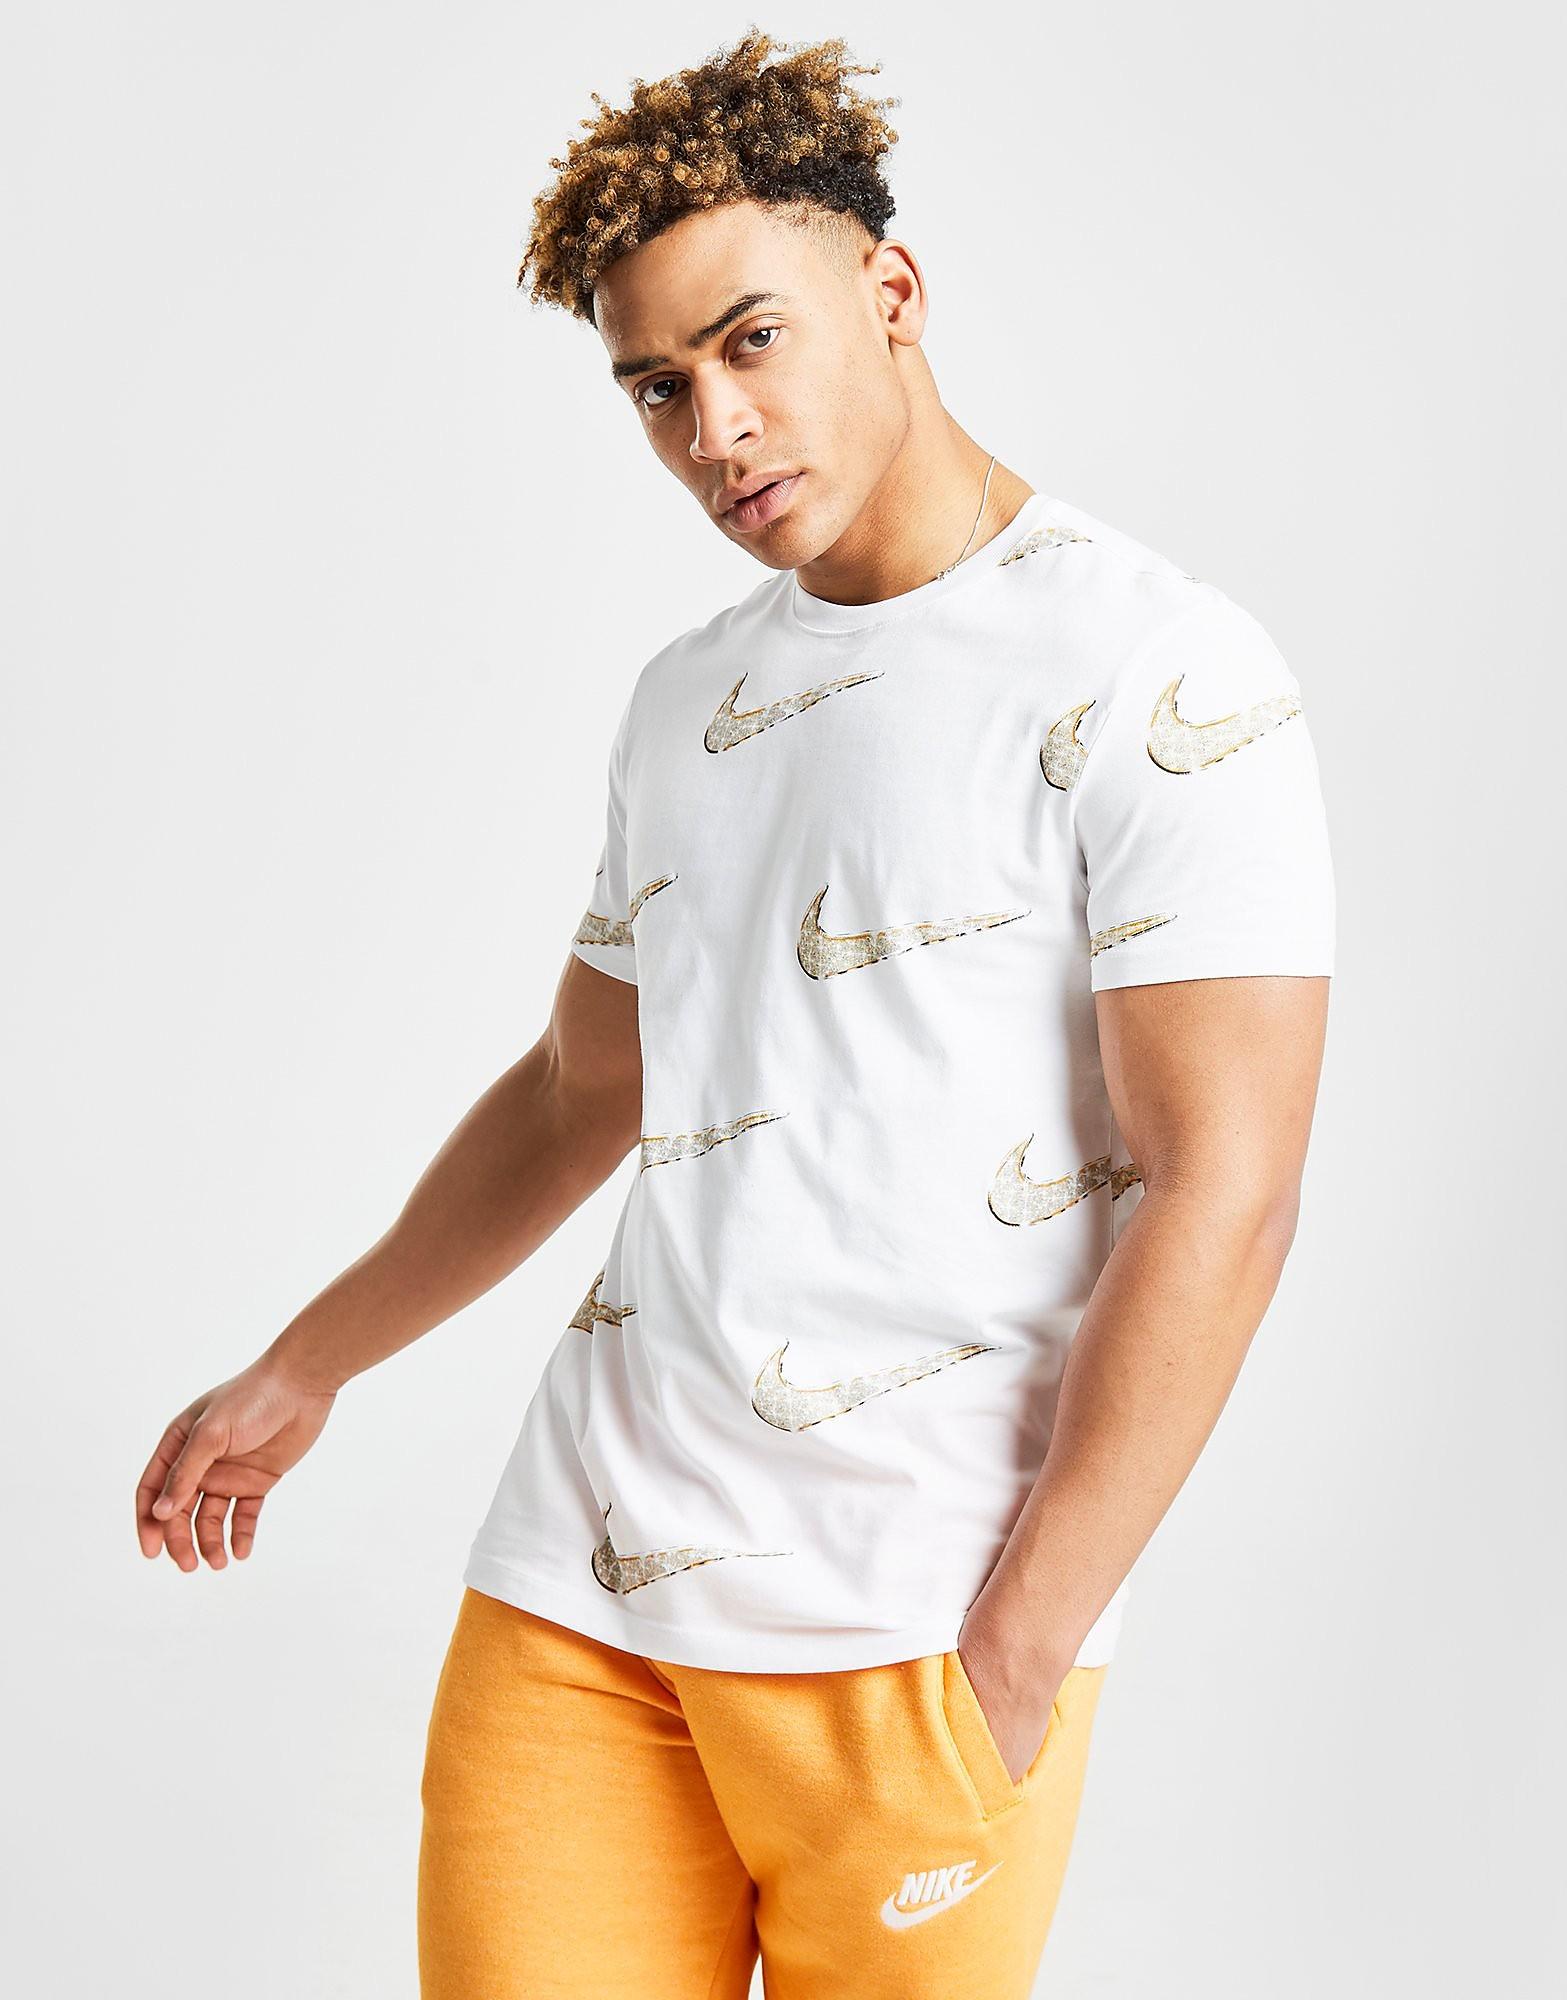 Nike Swoosh T-Shirt Herren - Weiss - Mens, Weiss